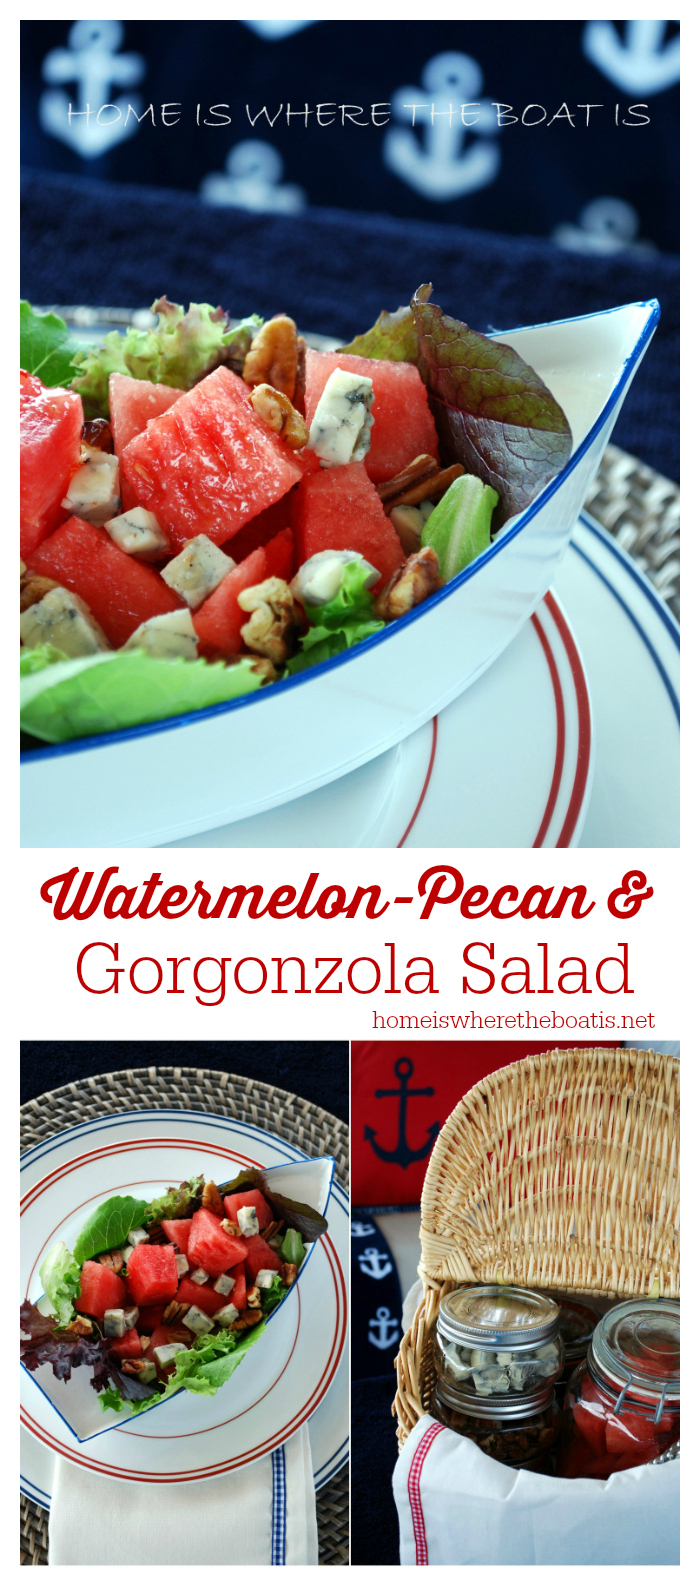 Watermelon, Pecan, and Gorgonzola Salad